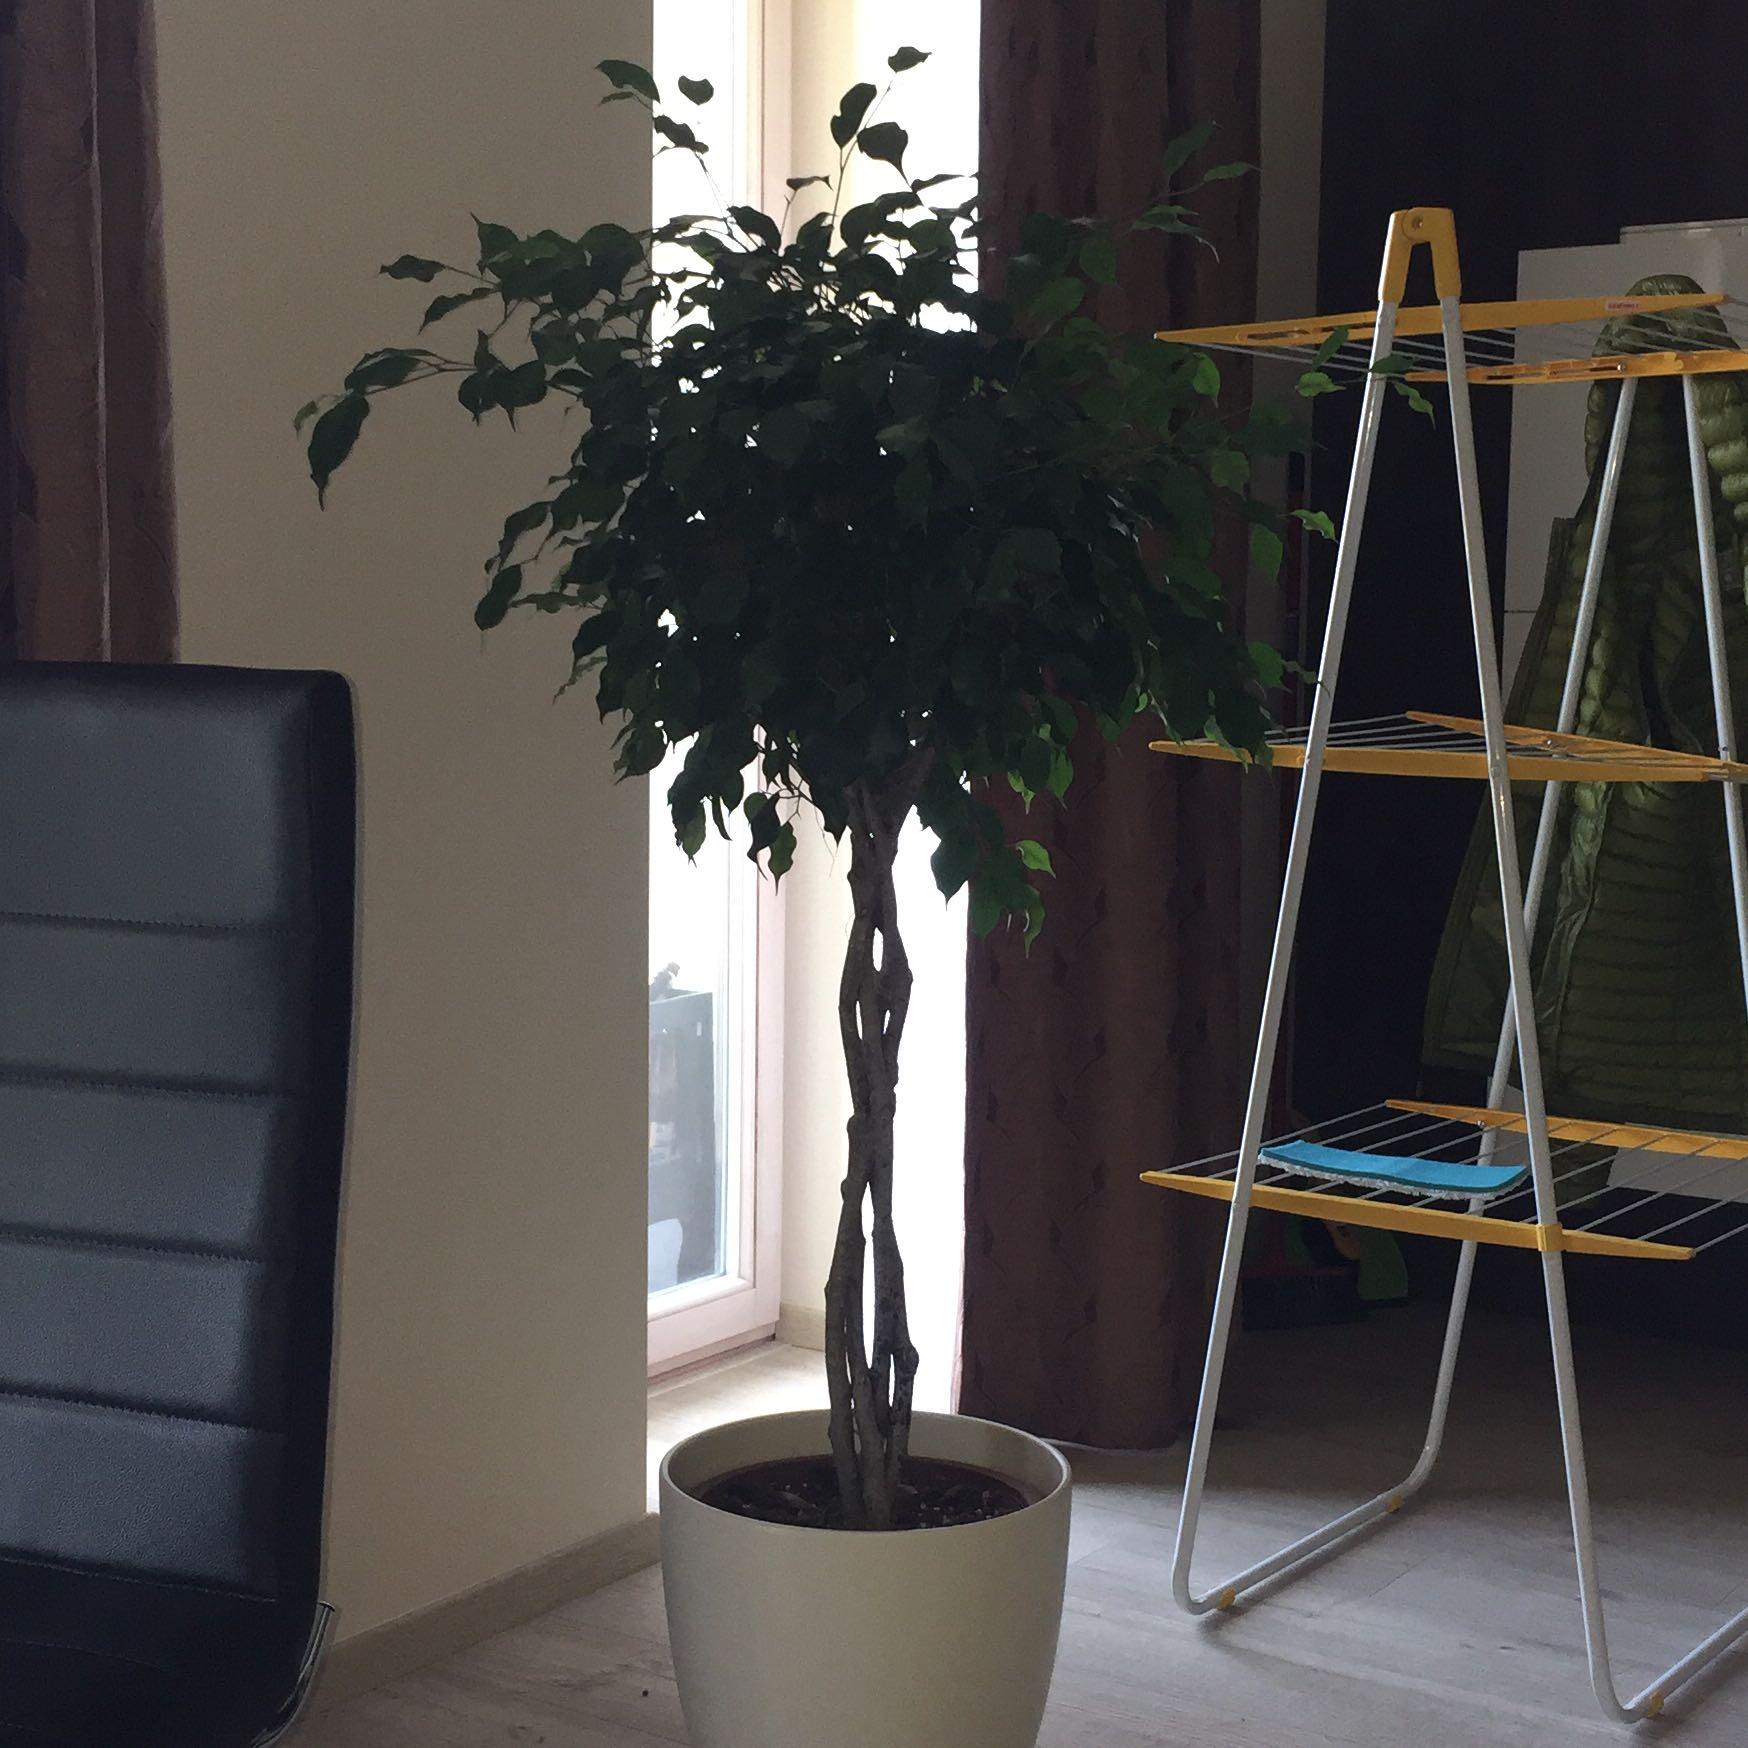 wie oft baum gie en garten pflanzen giessen. Black Bedroom Furniture Sets. Home Design Ideas